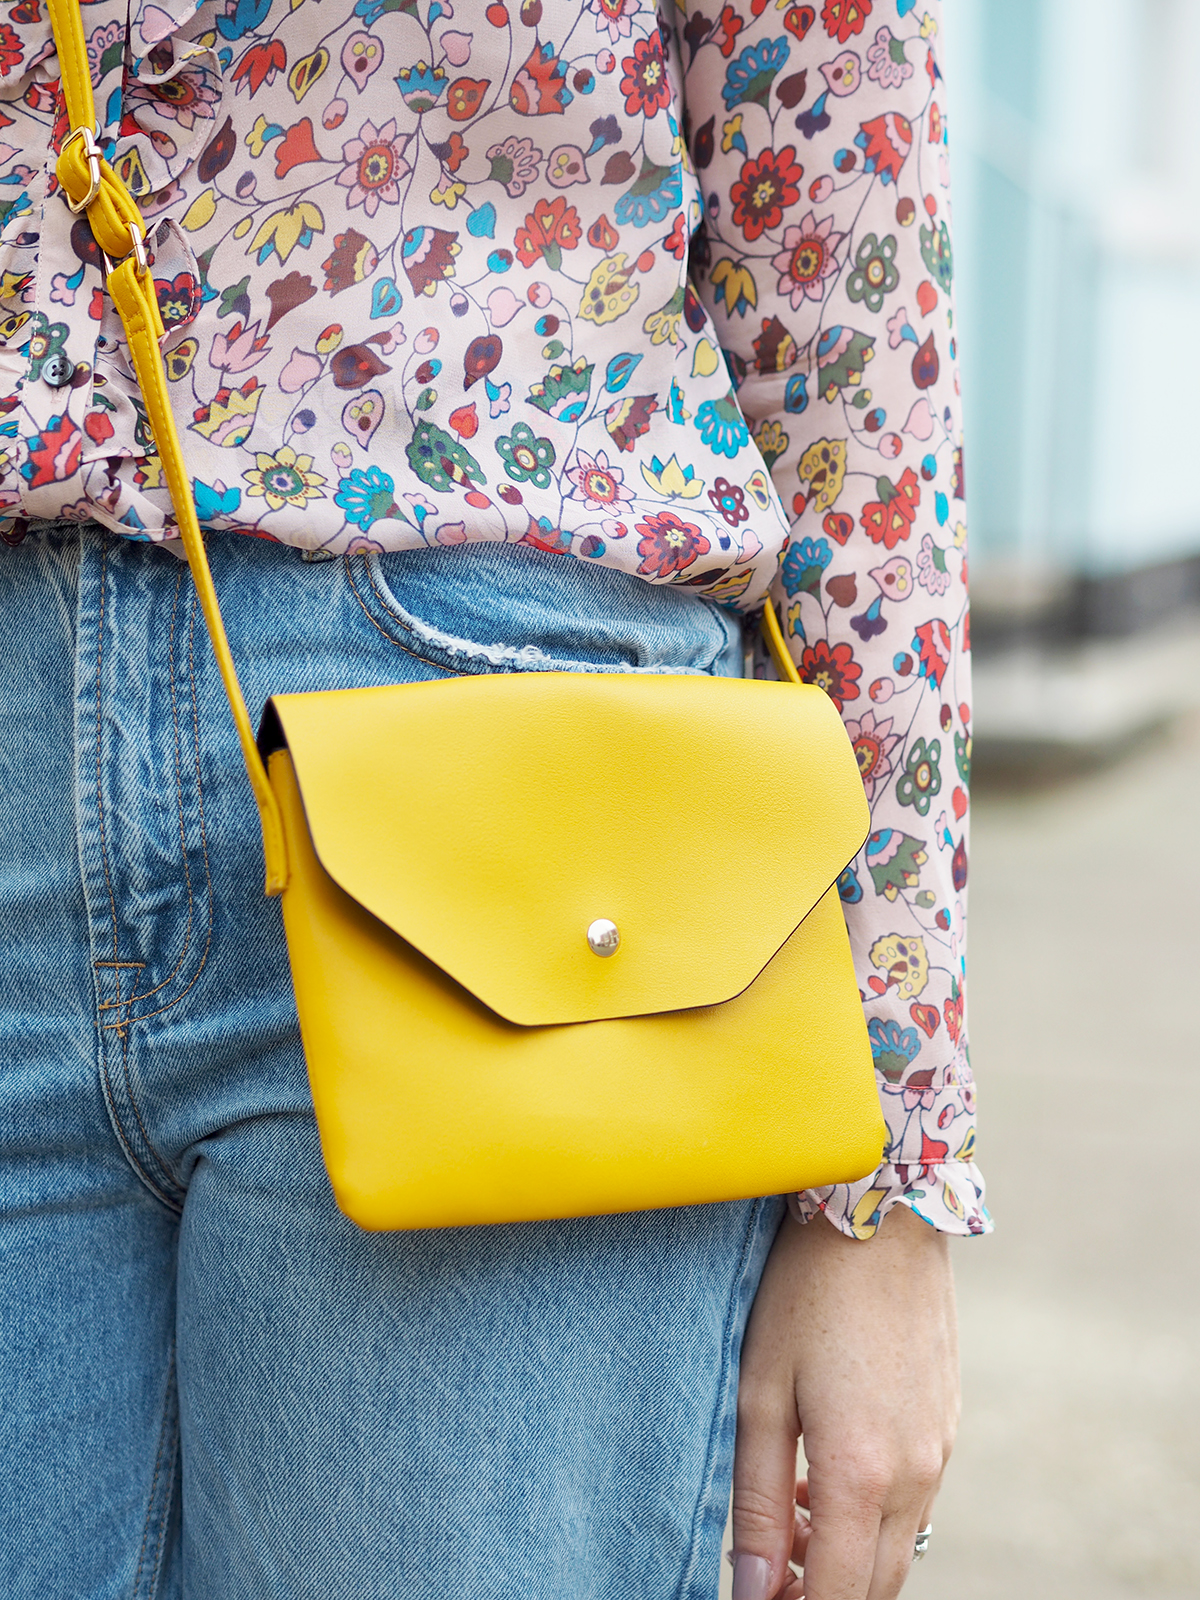 boden floral silk shirt outfit primark yellow handbag